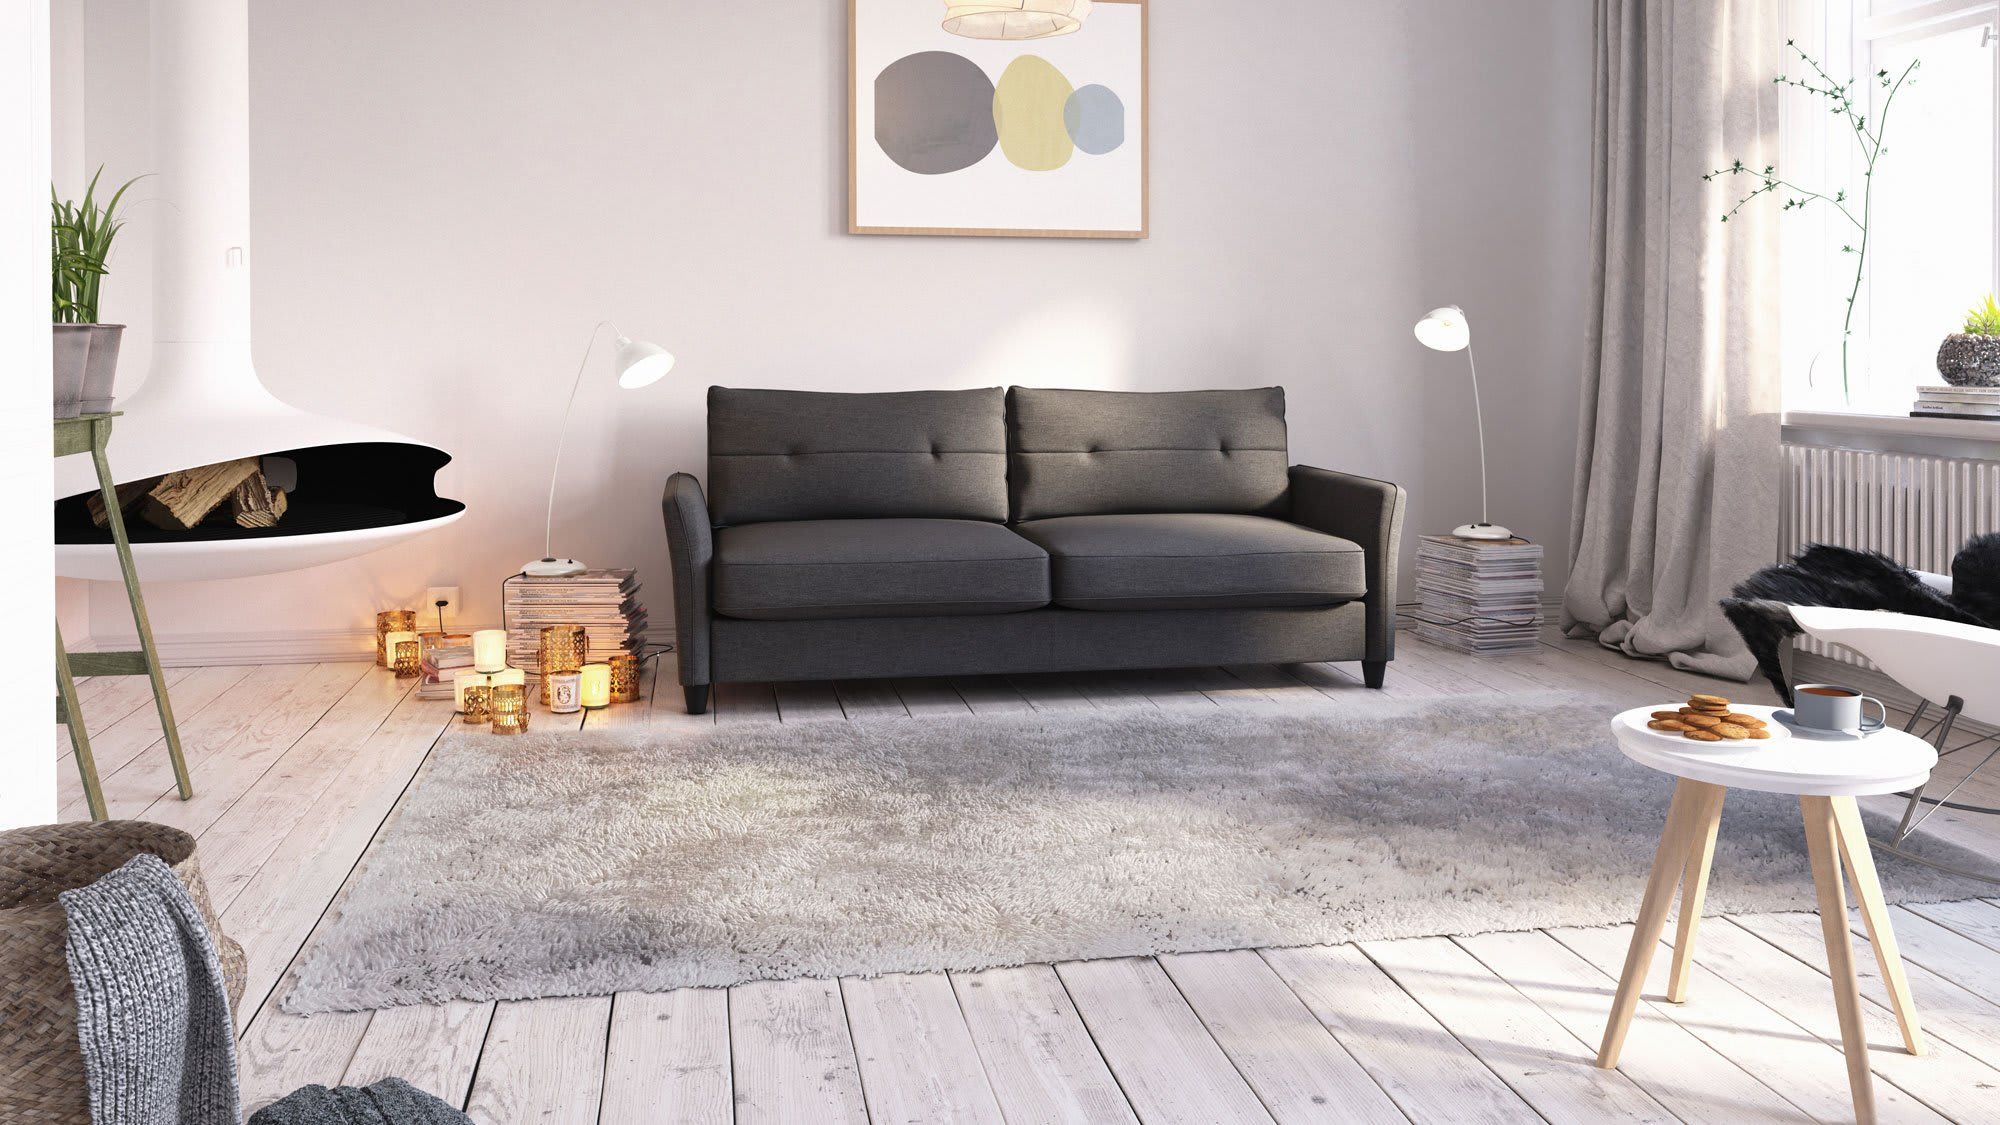 Living Room Furniture, Affordable Sofa, Loveseat, Zinus